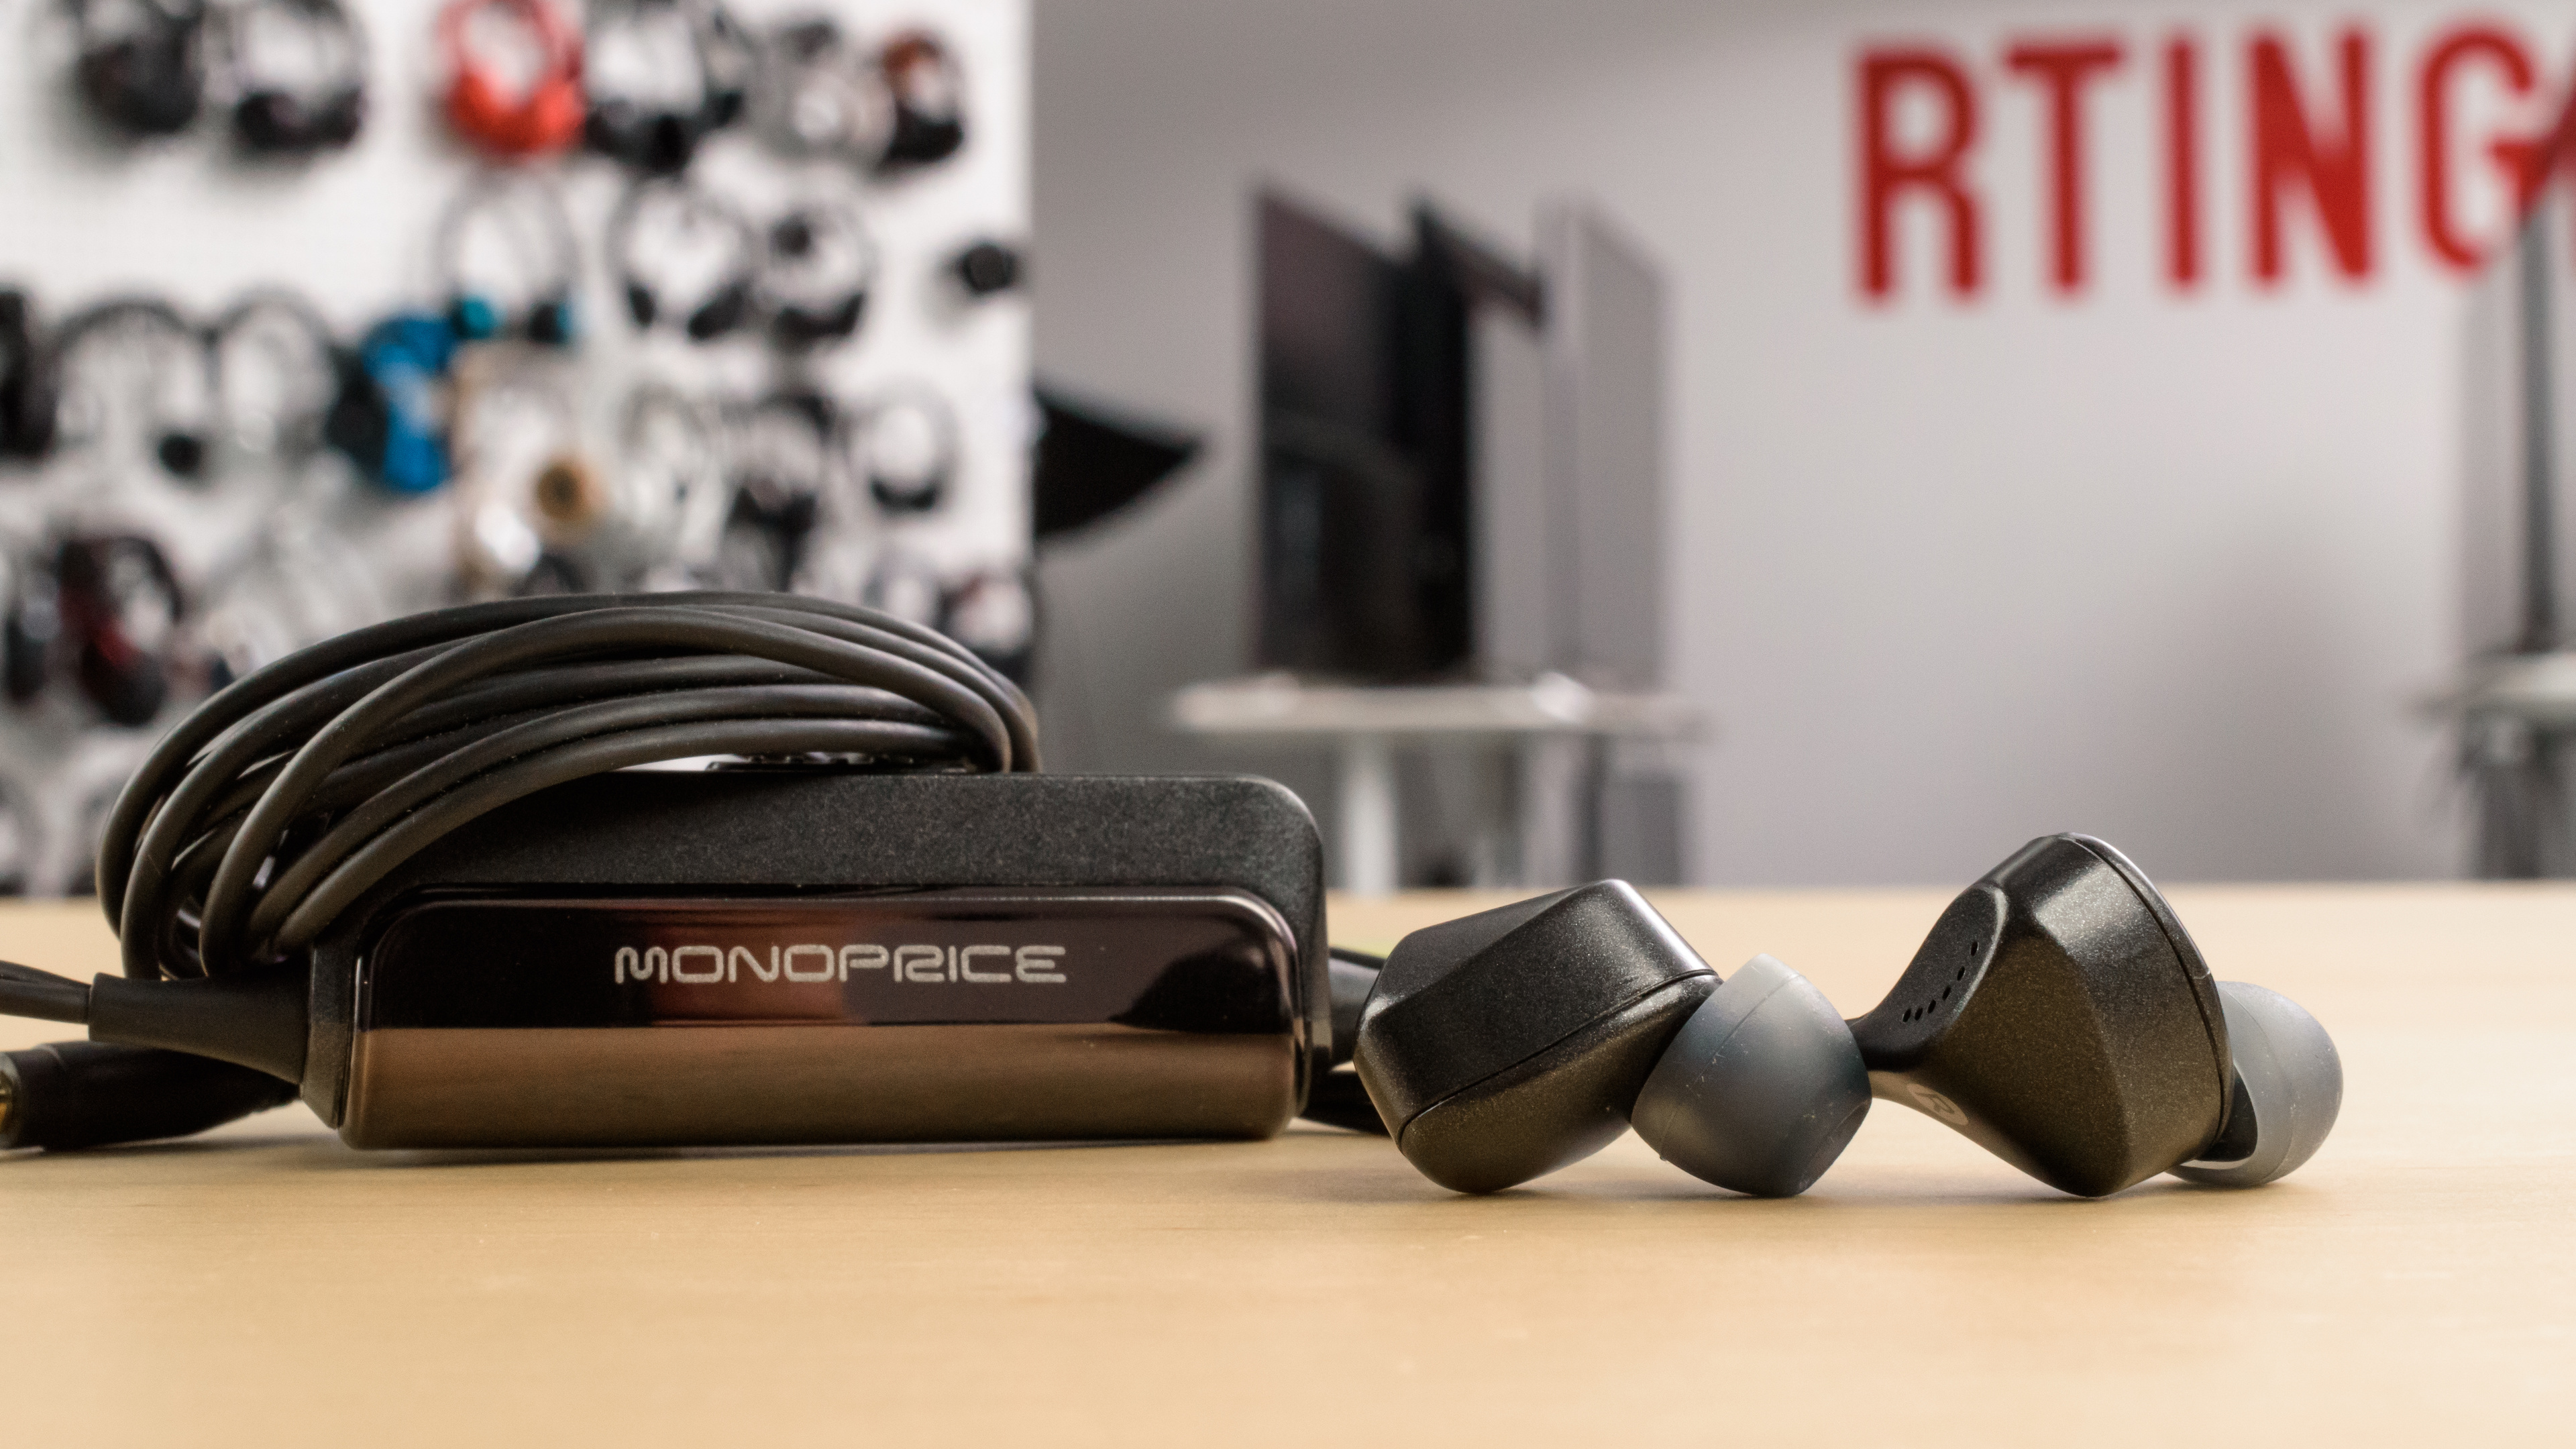 3e3f93a4c3f Monoprice 10799 Enhanced Active Noise Cancelling Earphones Review ...